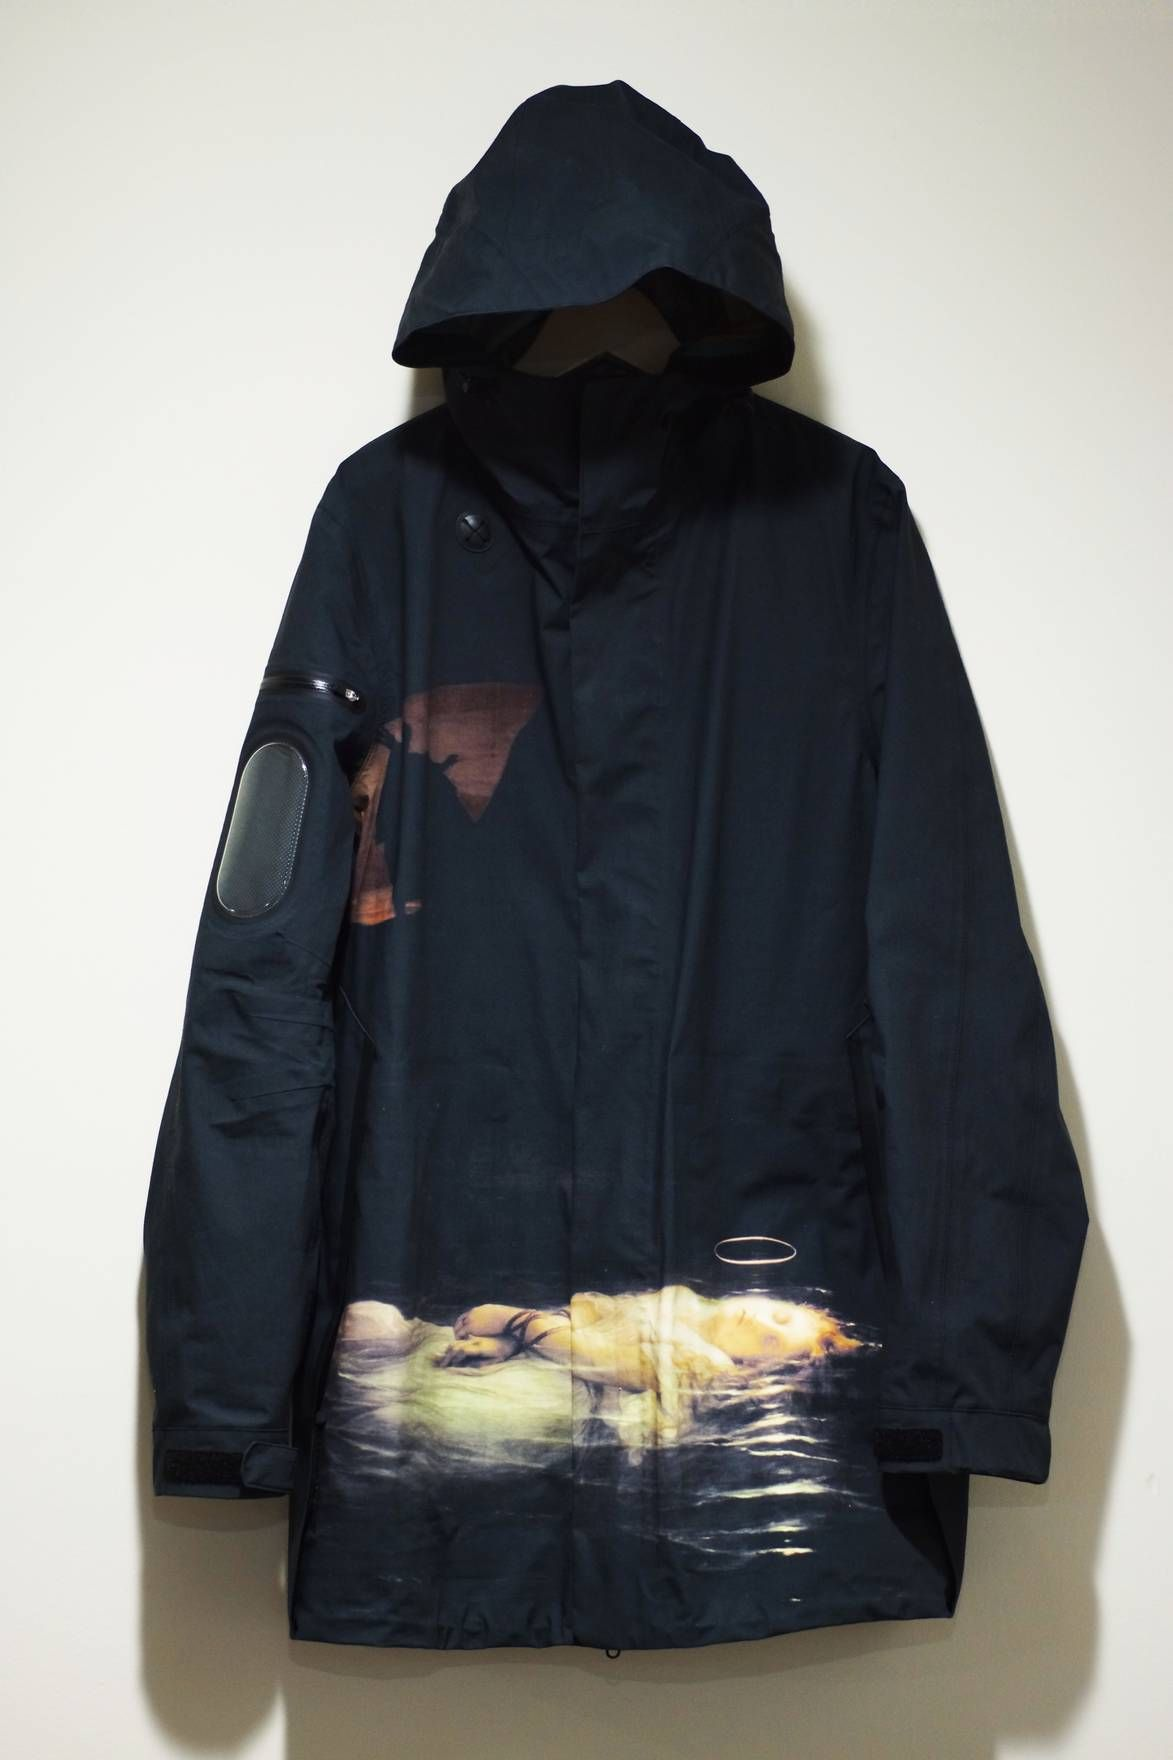 b8943cbd3308 Undercover Martyr Gore-Tex Parka Size US M   EU 48-50   2